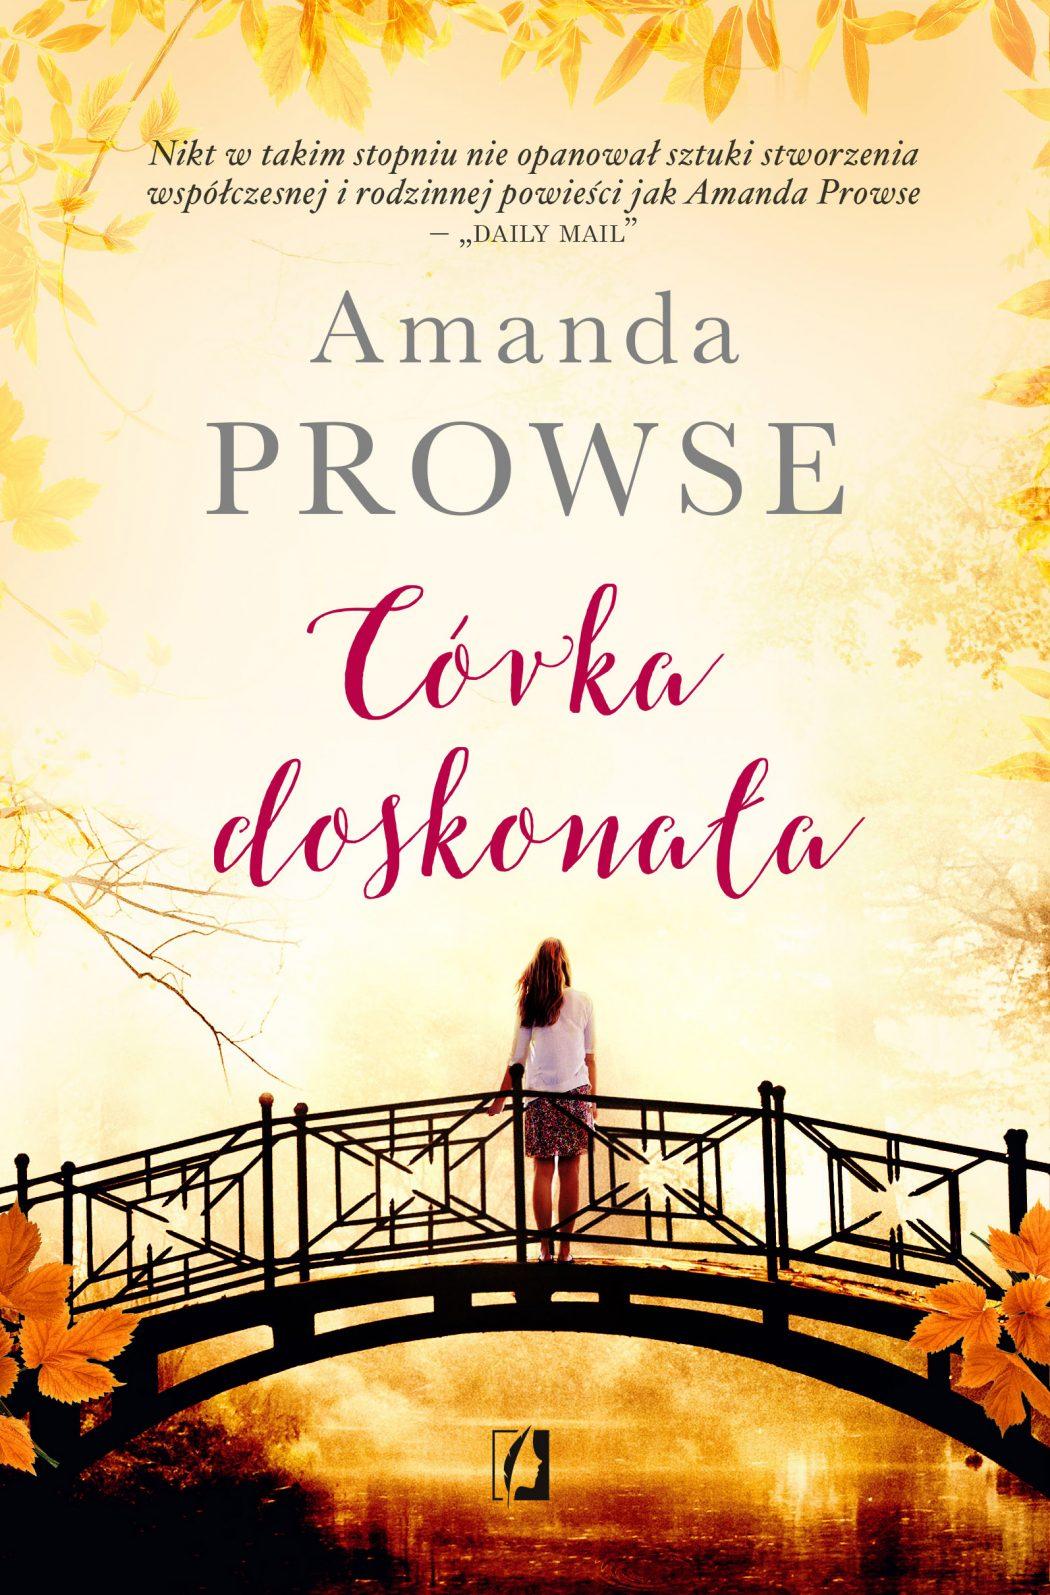 magazynkobiet.pl - Córka doskonala 300 1050x1595 - Córka idealna - Amanda Prowse